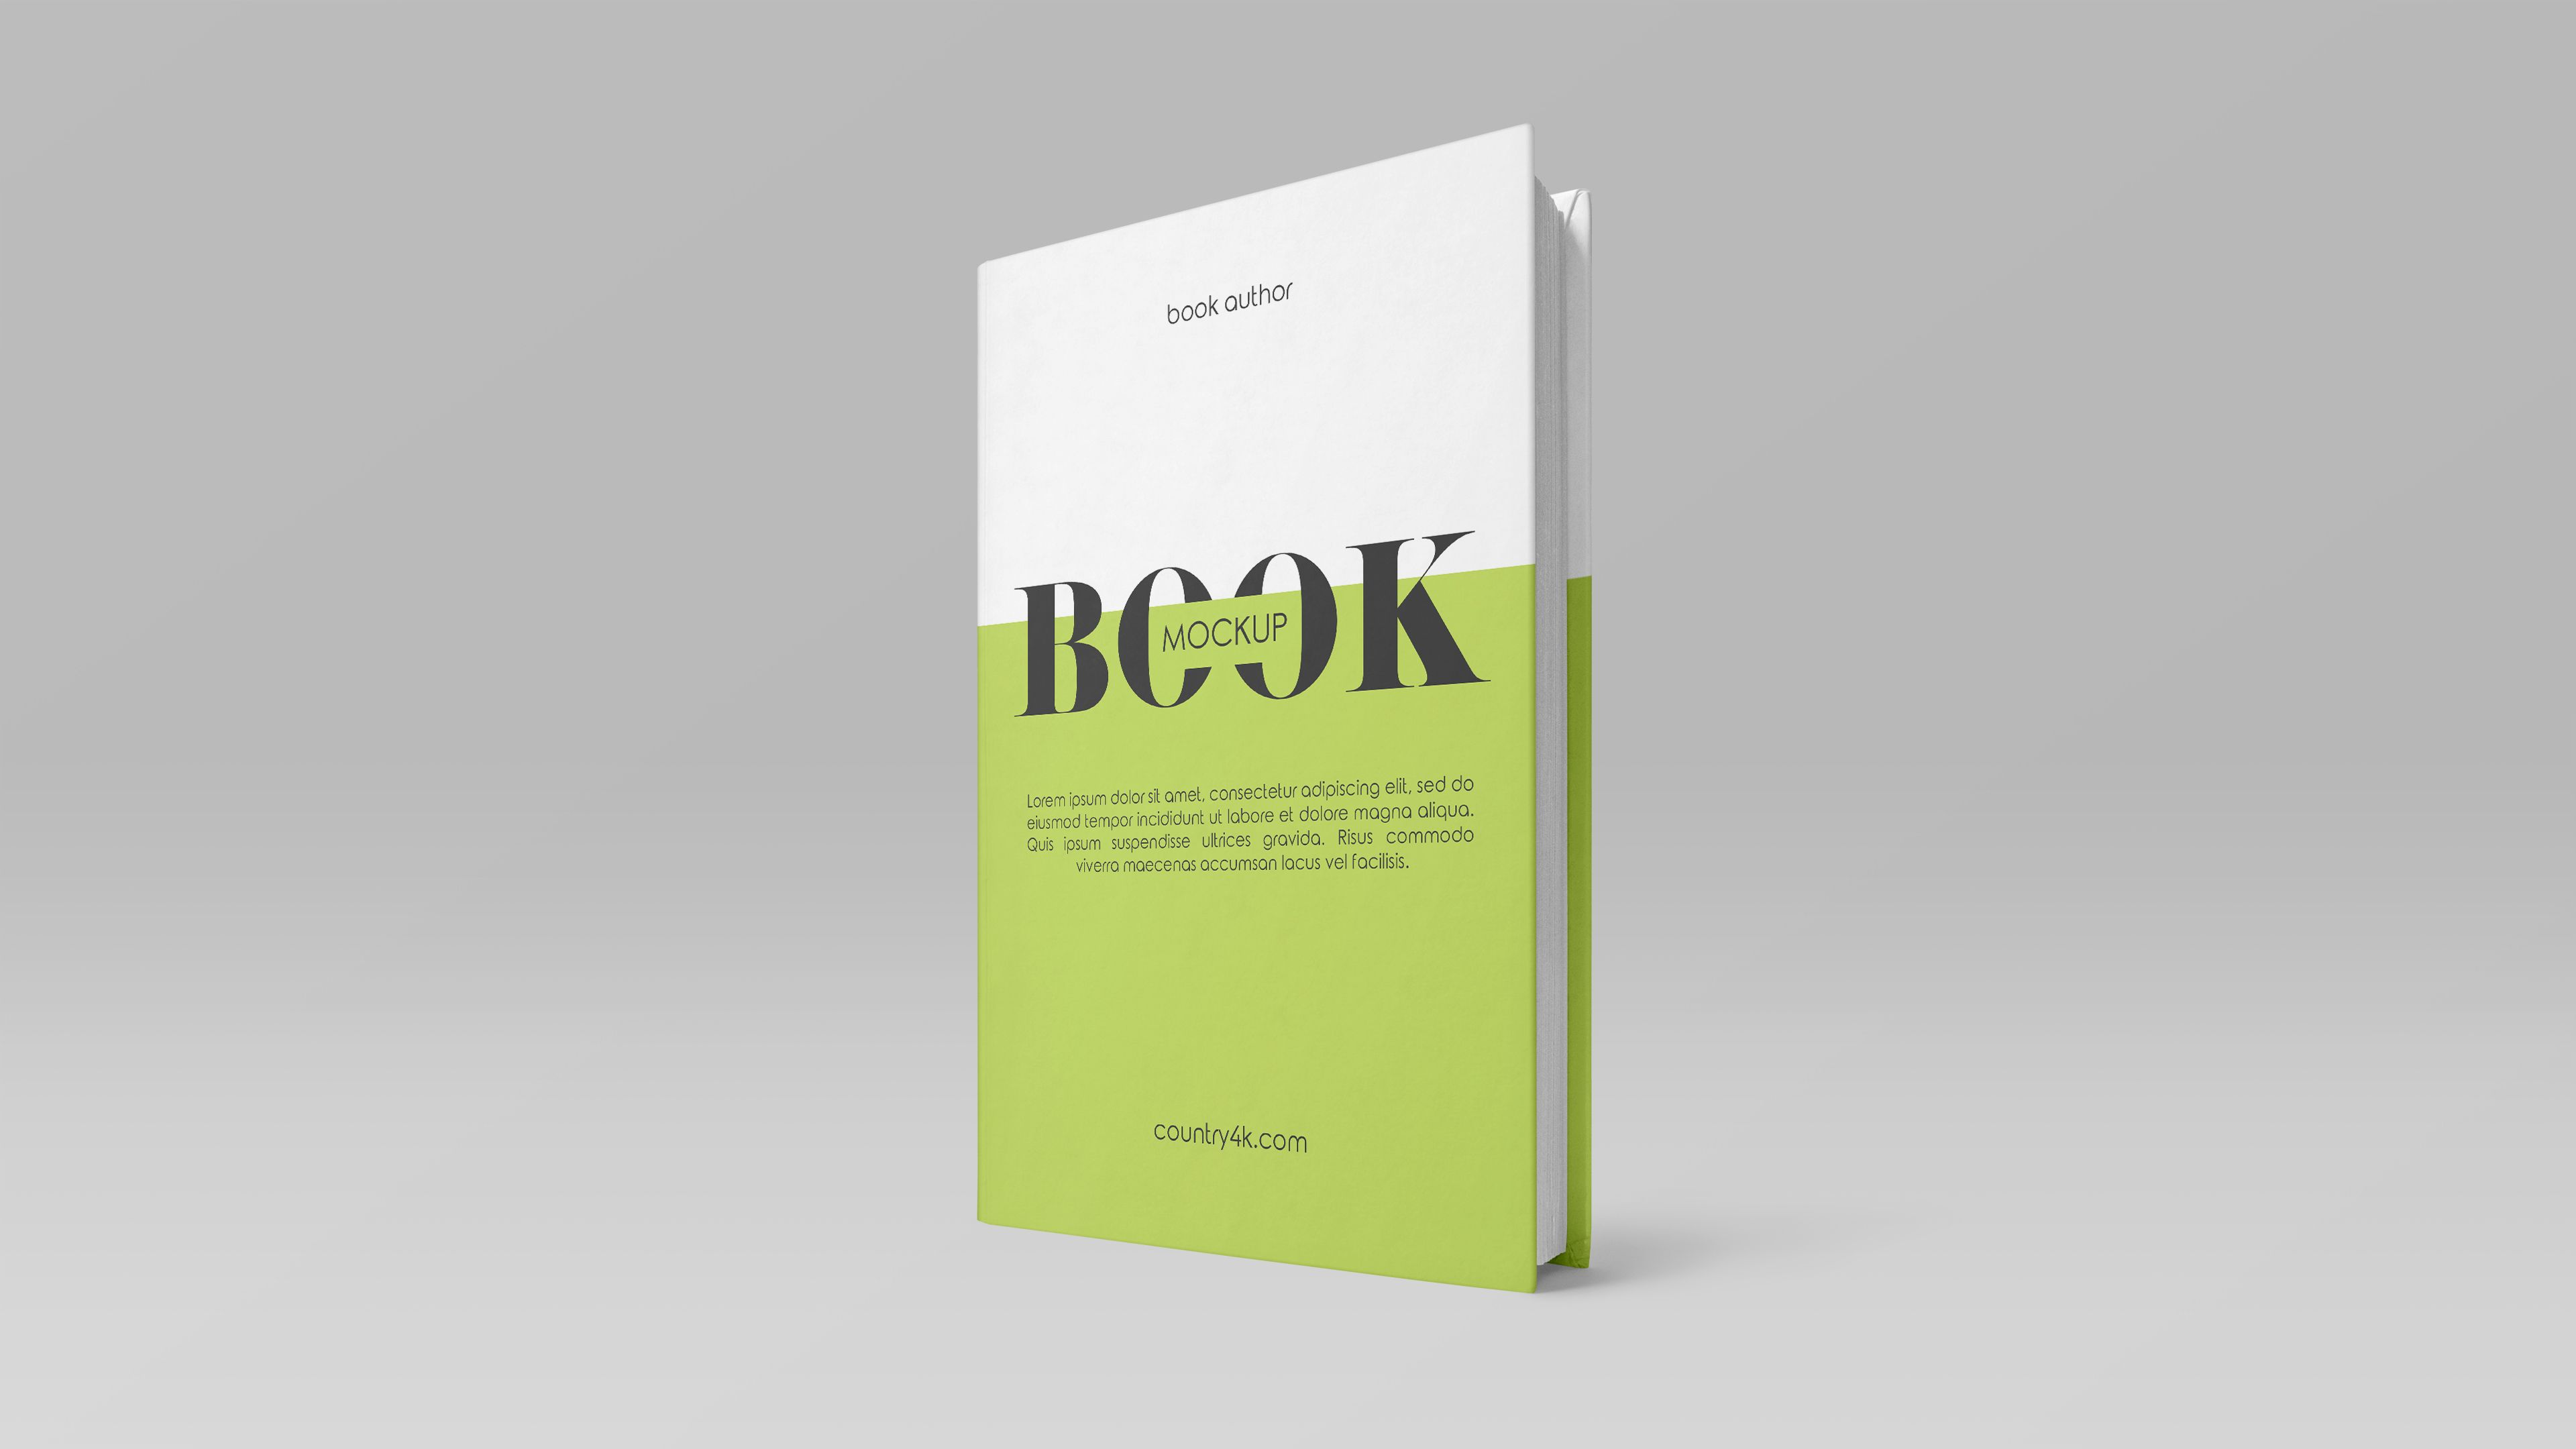 Free Book Cover Mockup Psd Book Cover Mockup Free Mockup Book Free Mockup